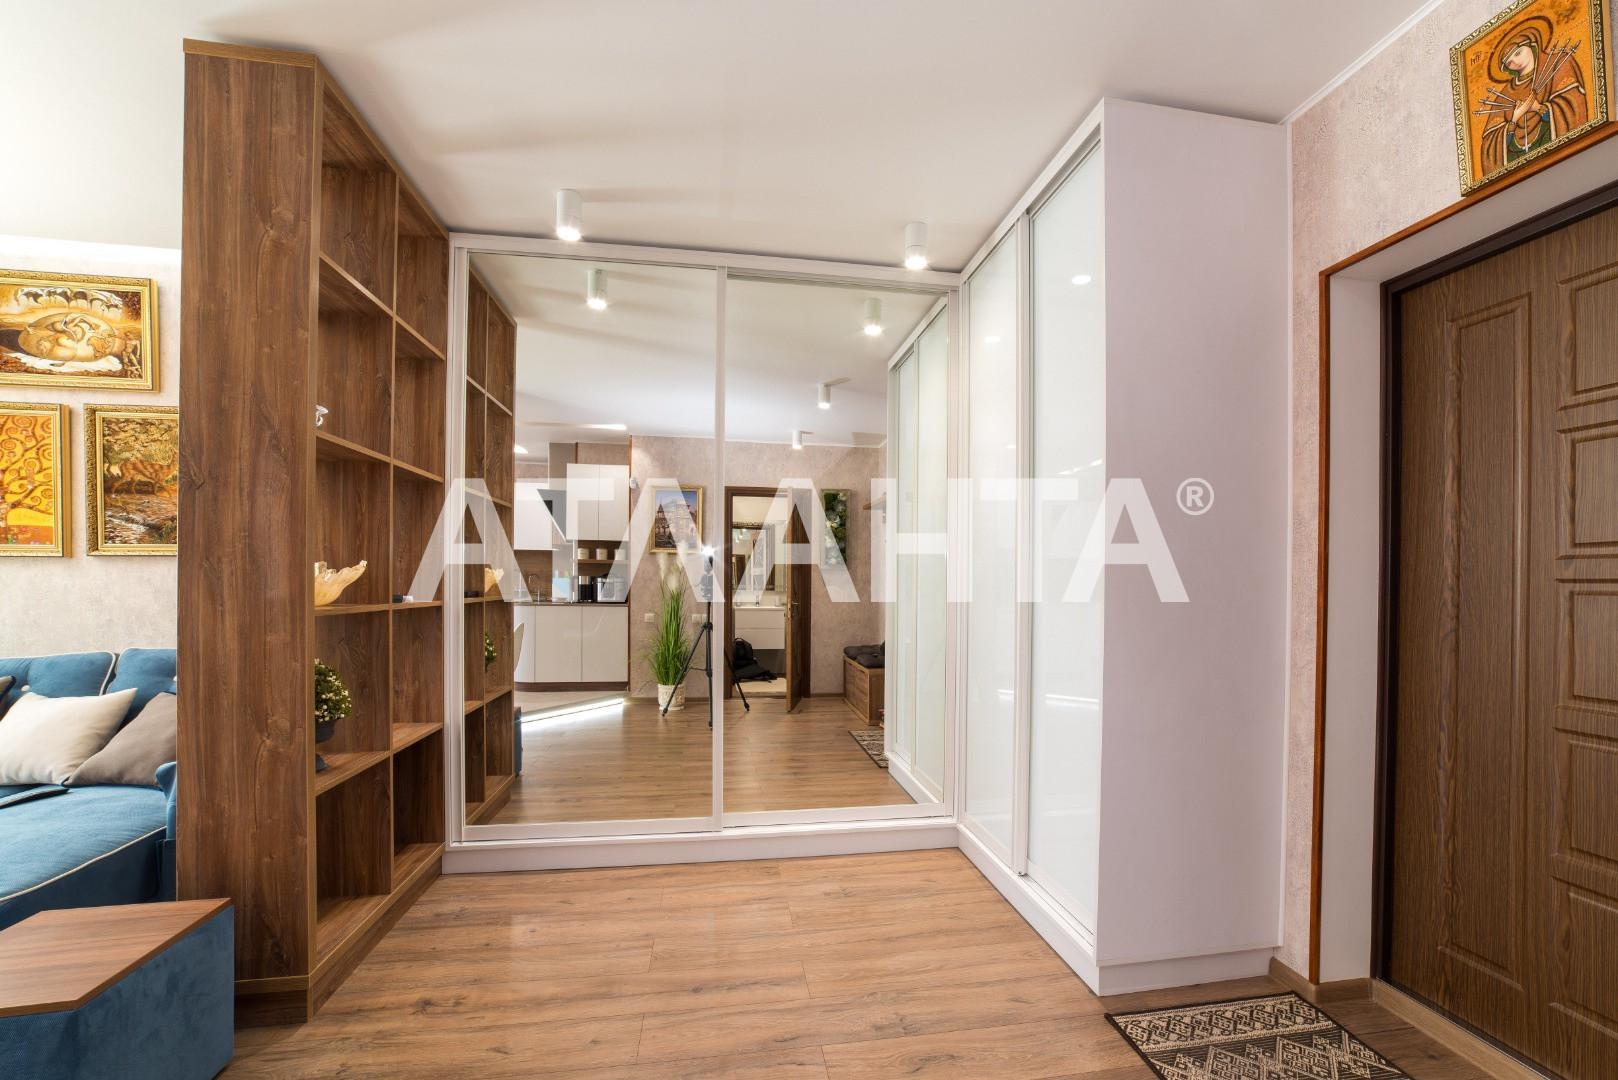 Продается 1-комнатная Квартира на ул. Балковская (Фрунзе) — 50 000 у.е. (фото №19)